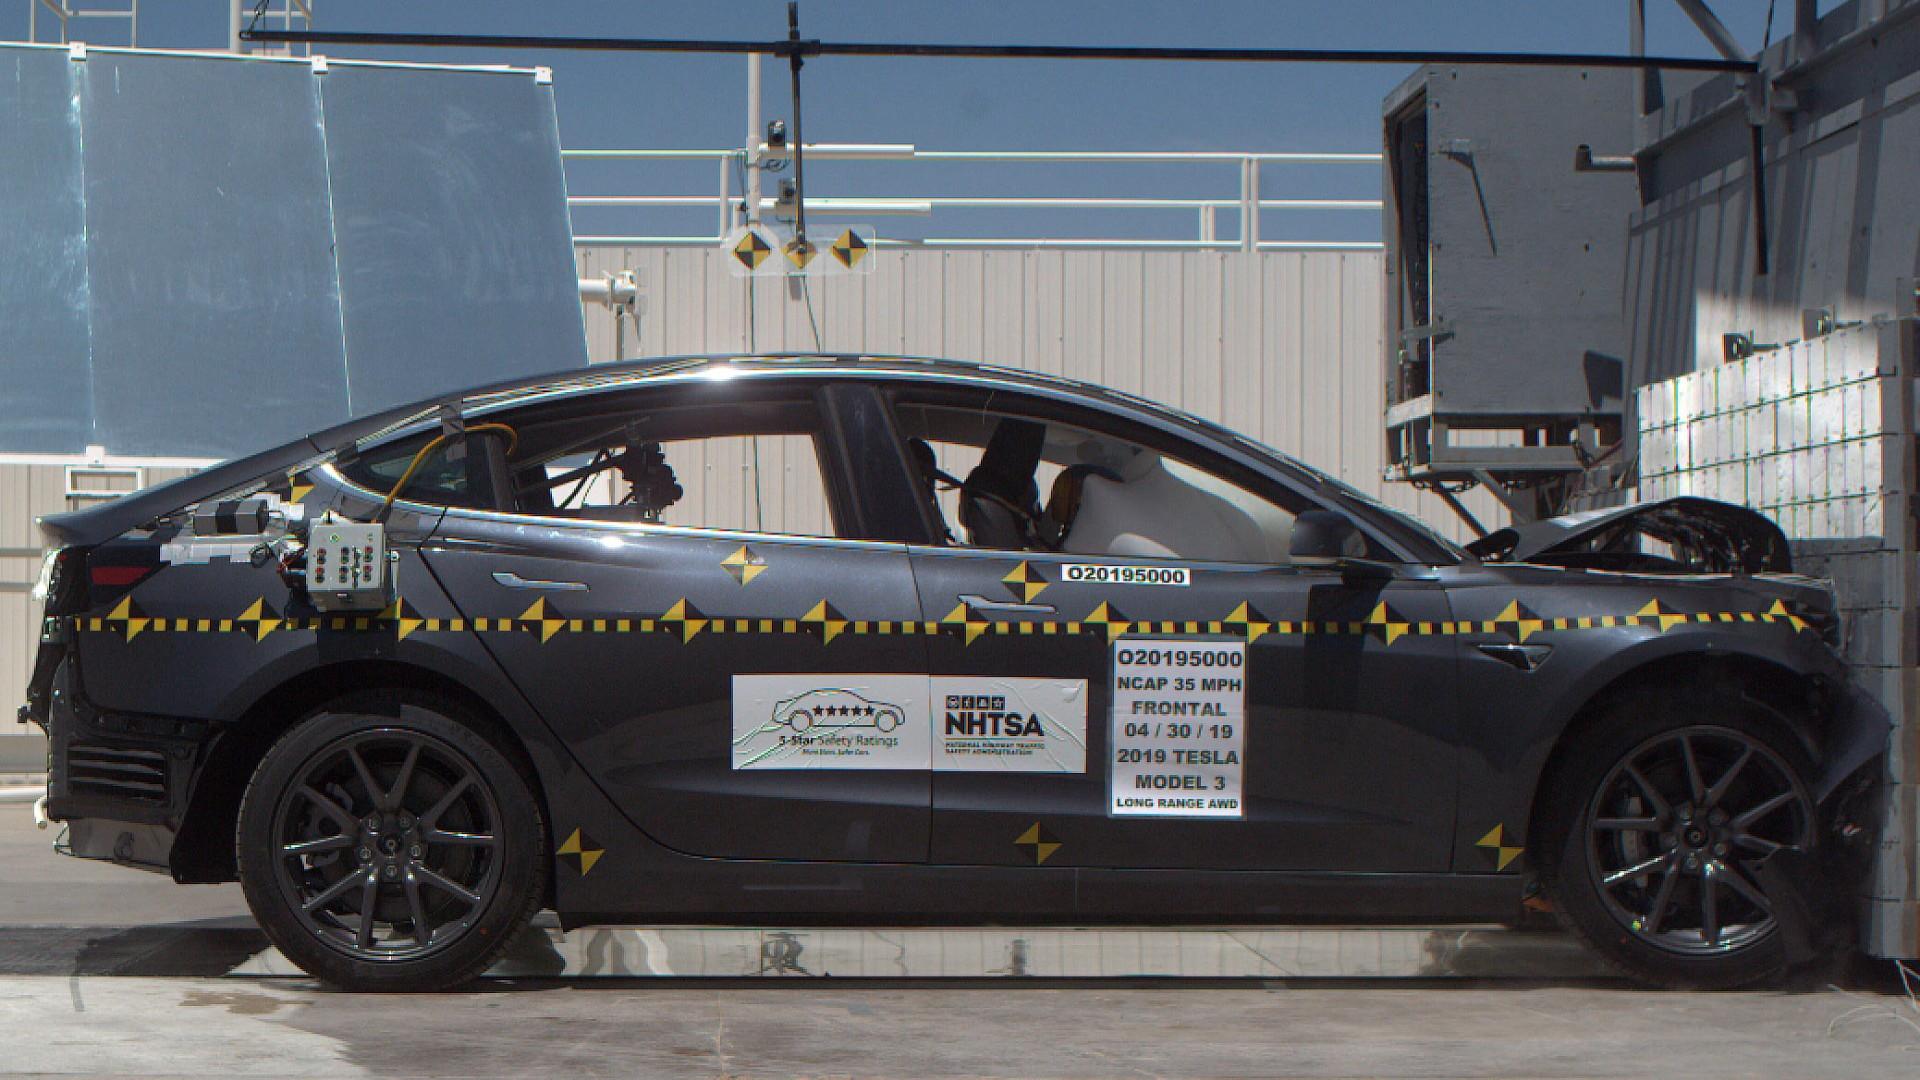 Tesla Model 3 News - Green Car Photos, News, Reviews, and Insights